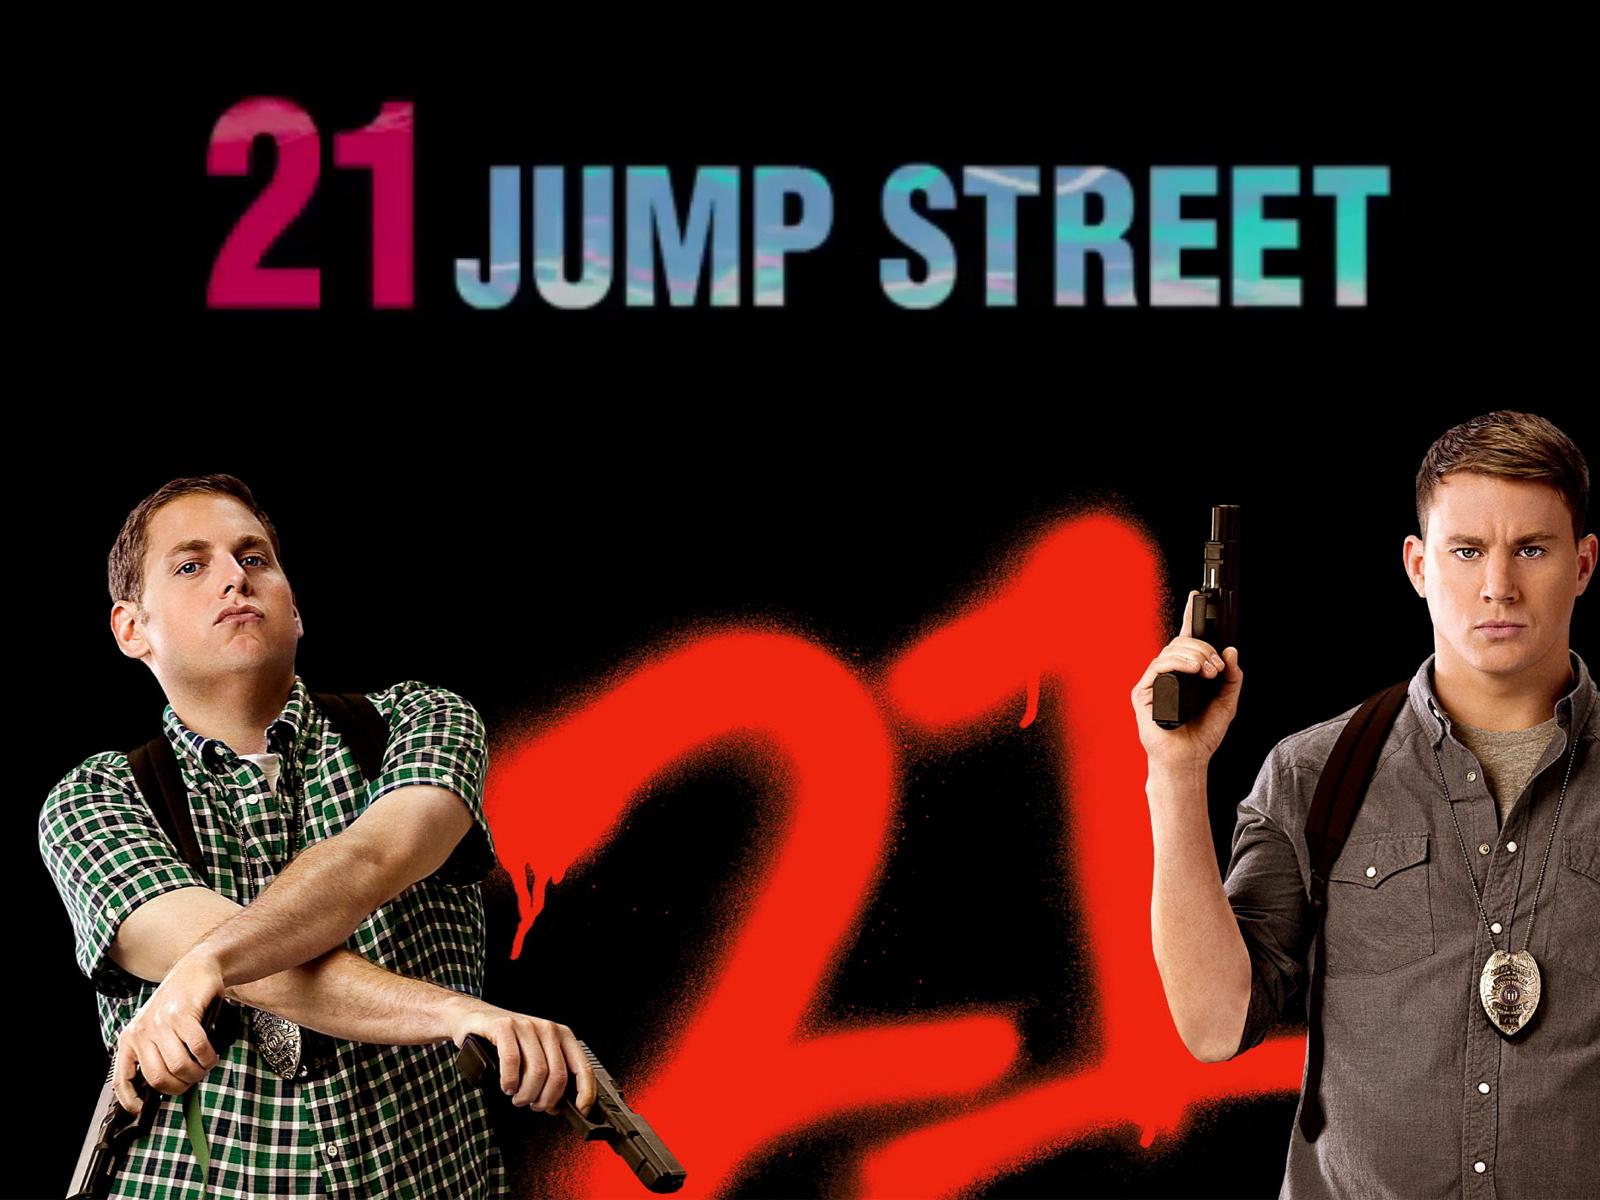 21 jump street 11129